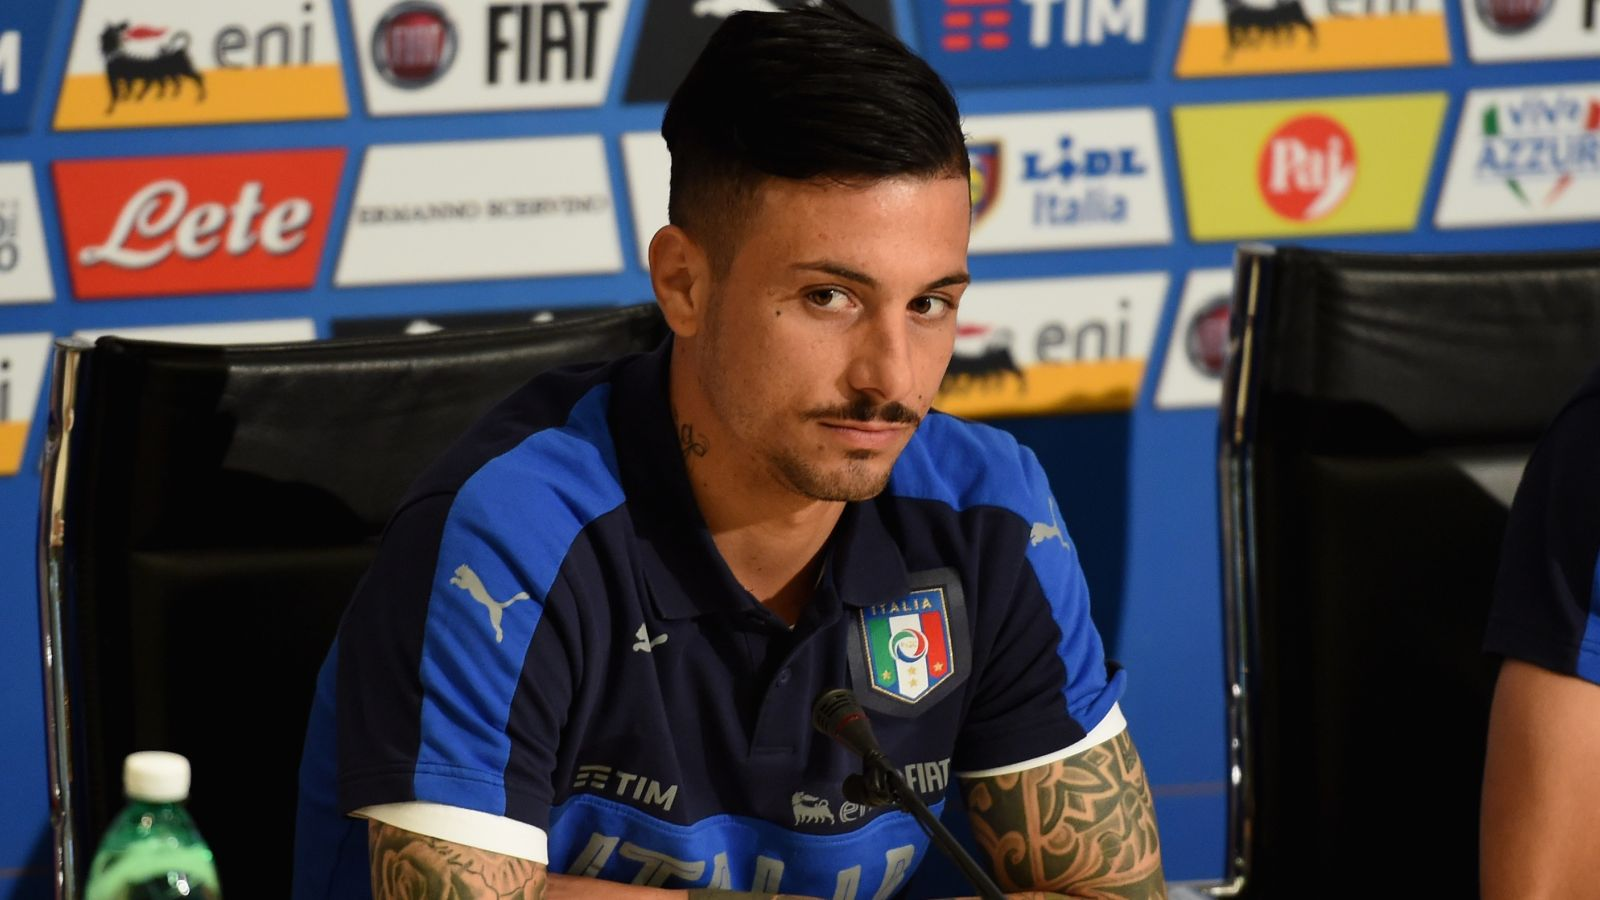 Genoa defender Izzo denies involvement in match-fixing scandal